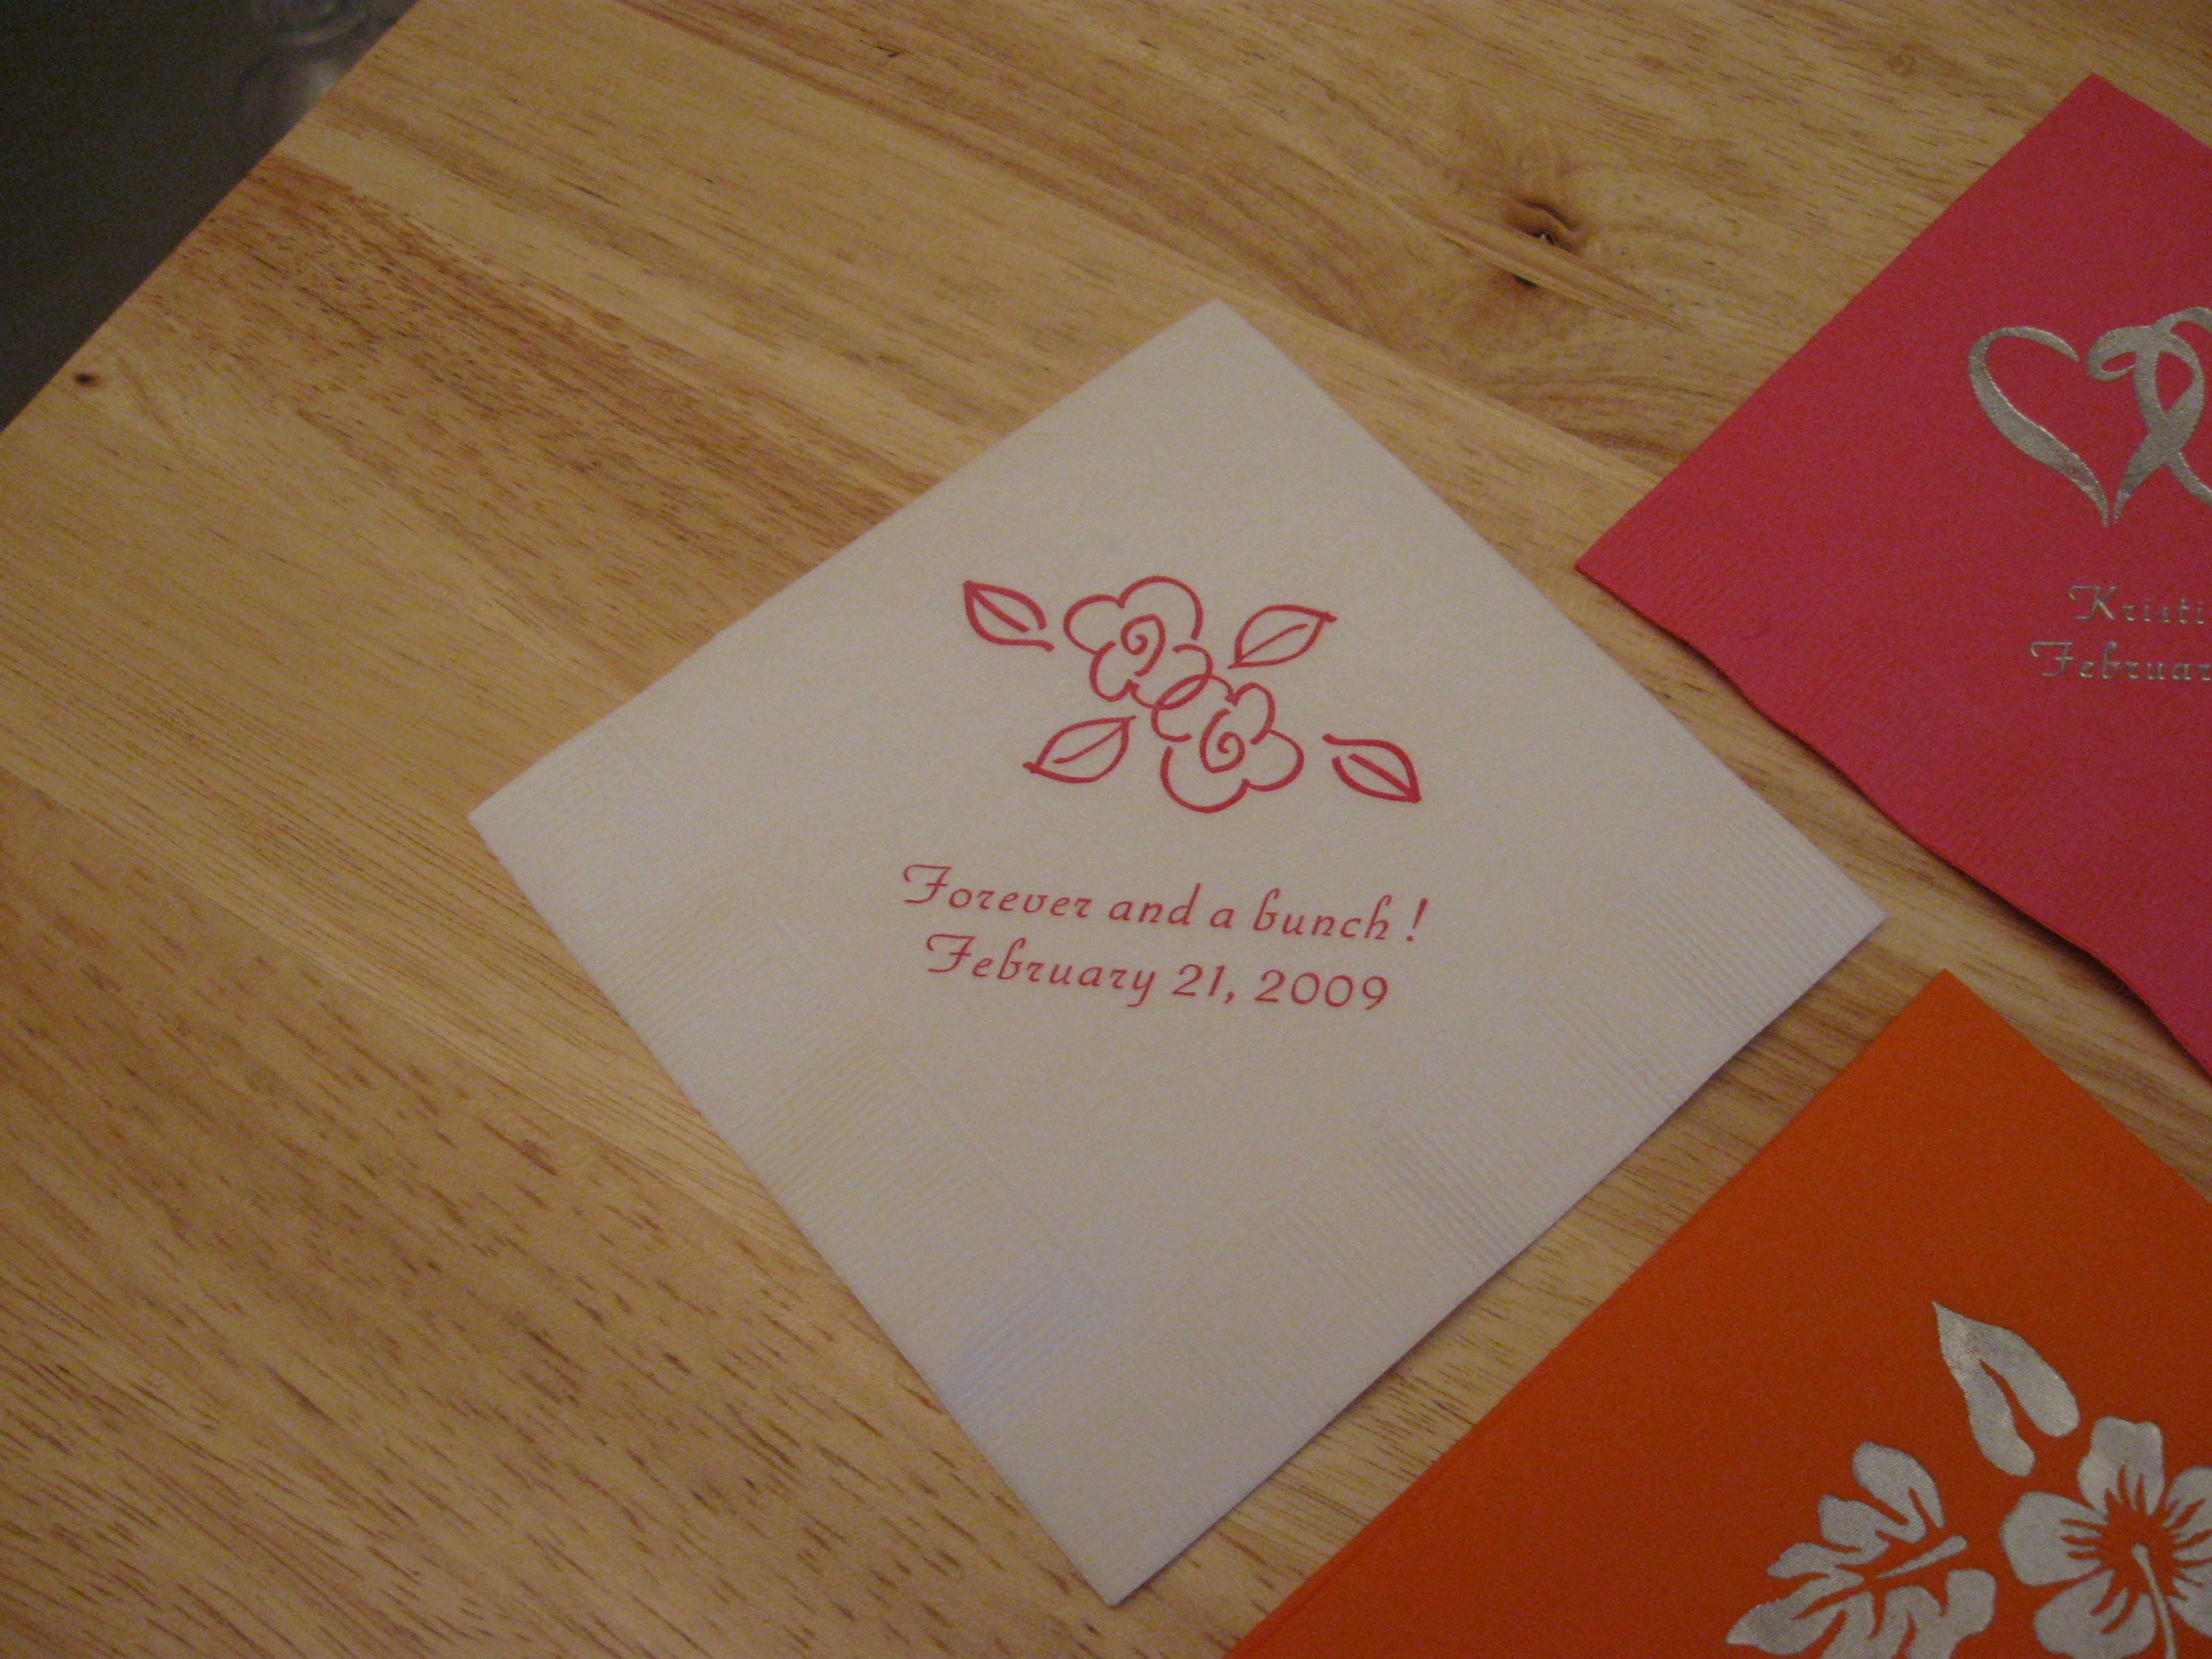 Reception, Flowers & Decor, Cocktail napkin